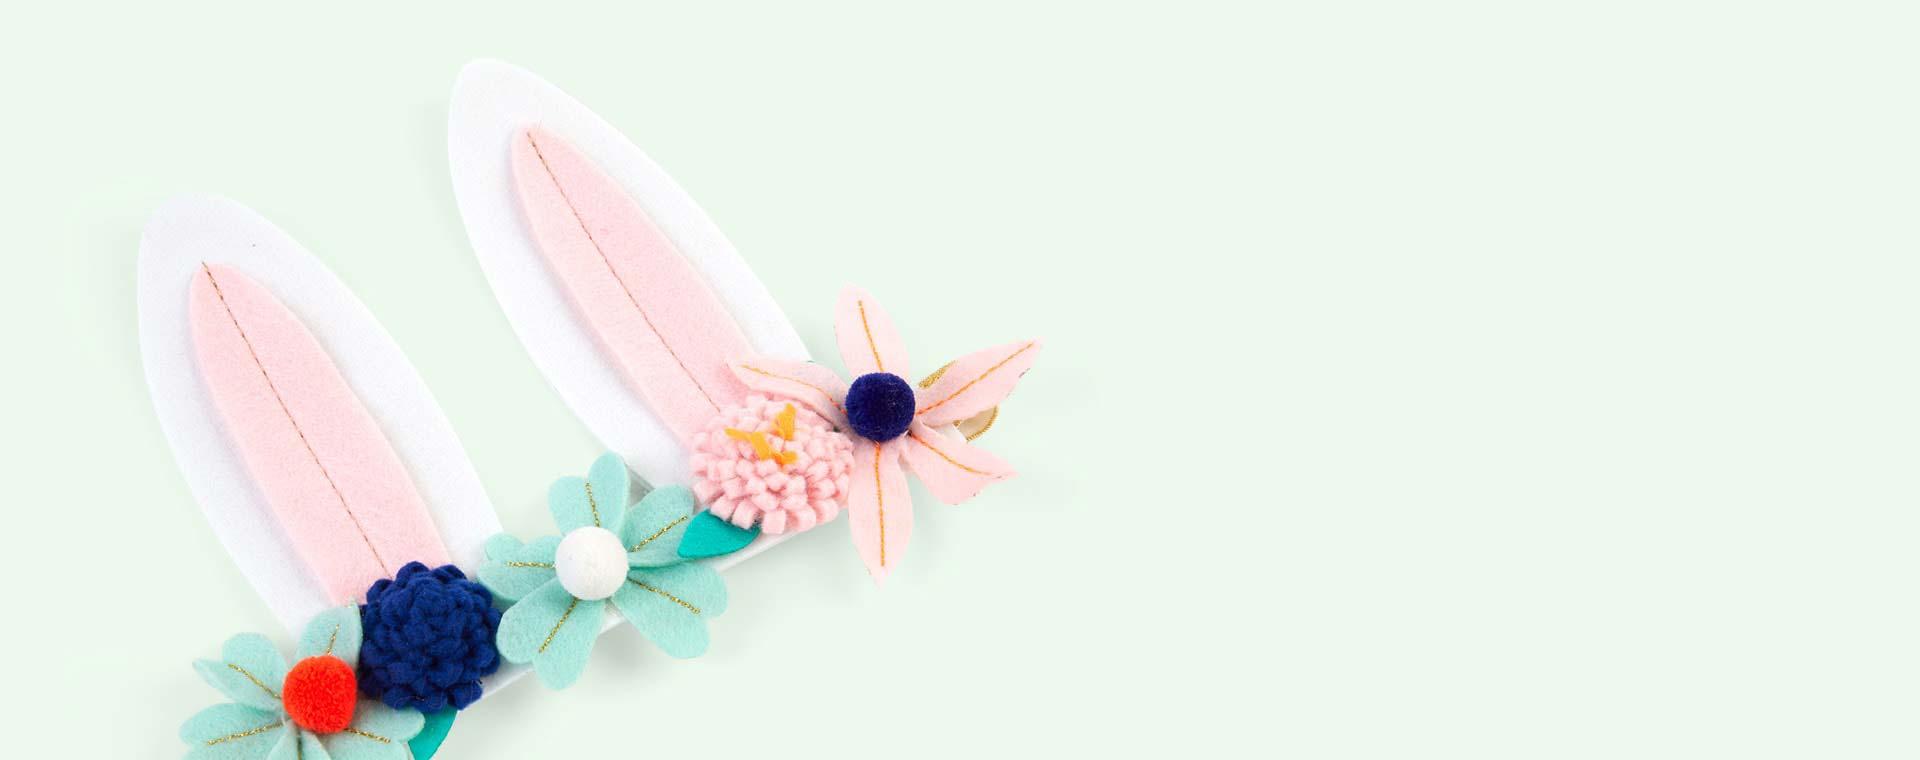 White Meri Meri Bunny Dress Up Kit